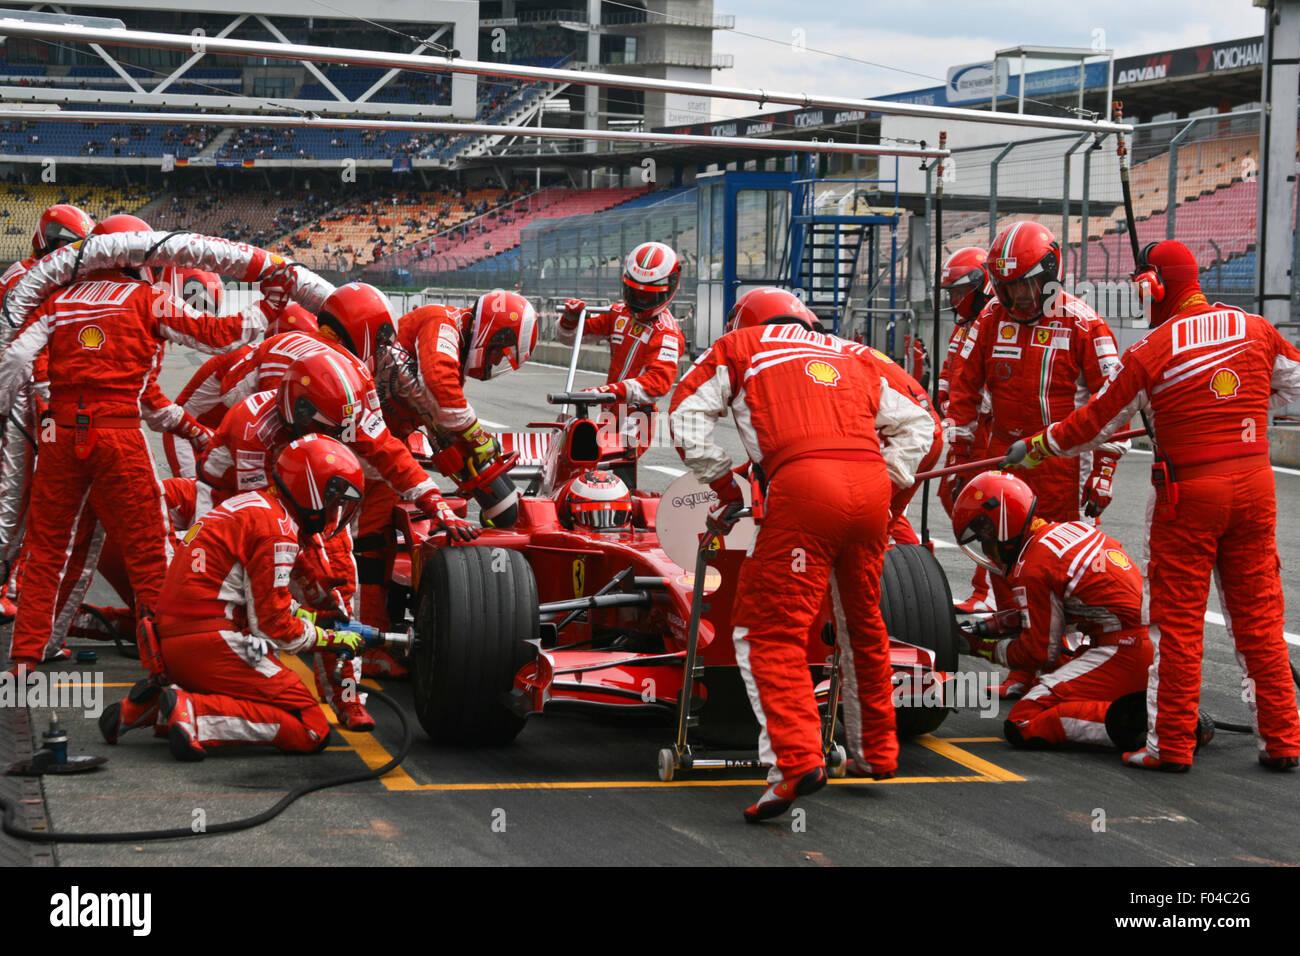 Ferrari f1 overalls